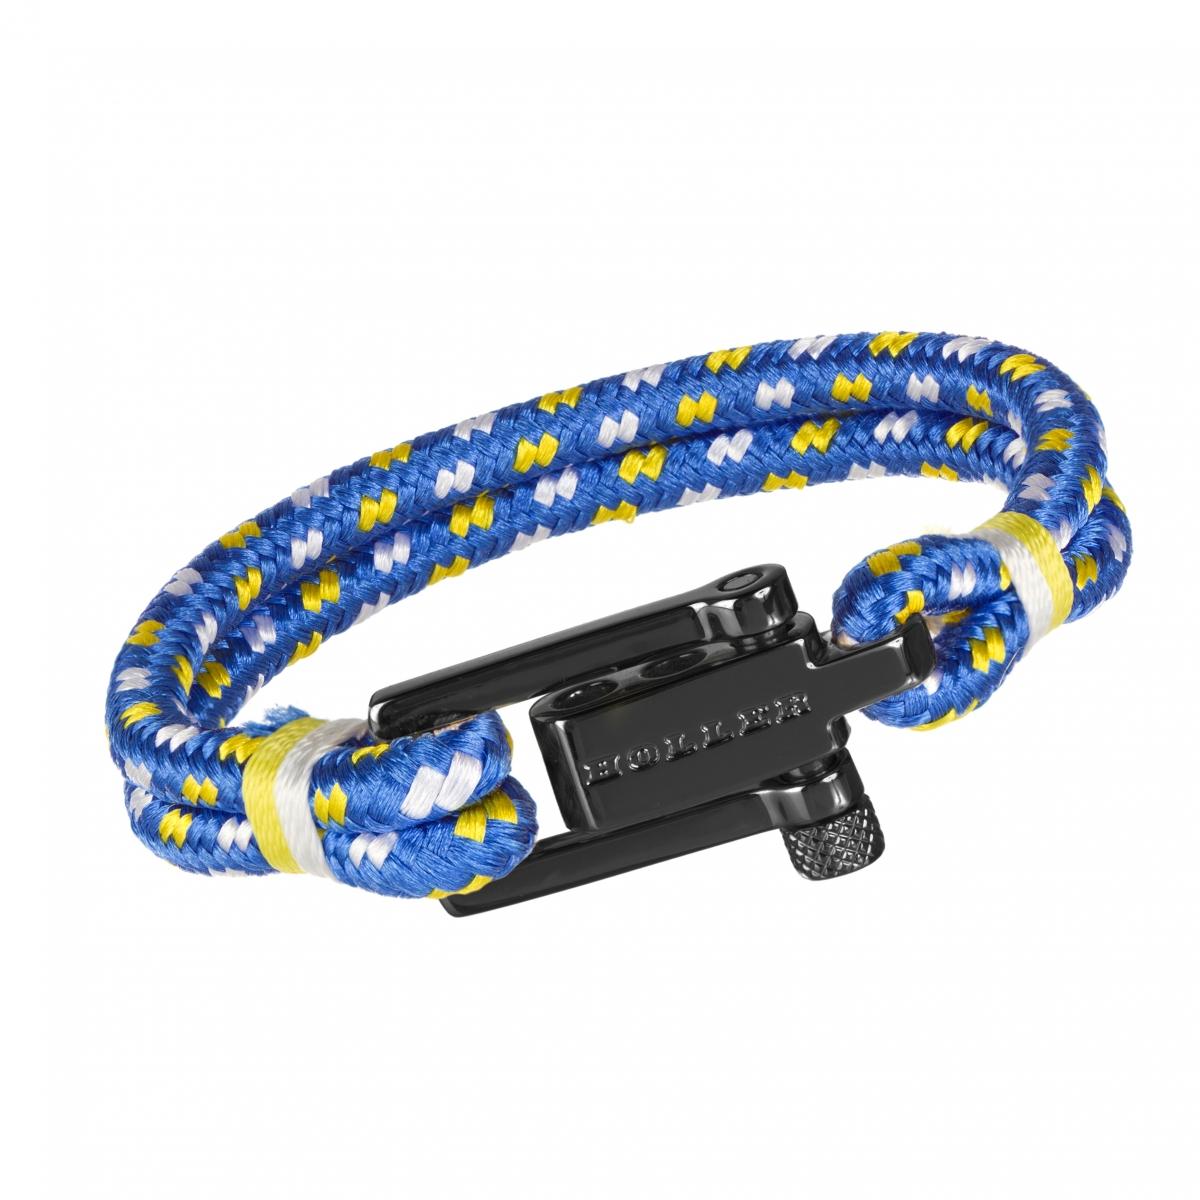 Mancha  Black Polished U-Buckle / Blue, White and Yellow Paracord Bracelet